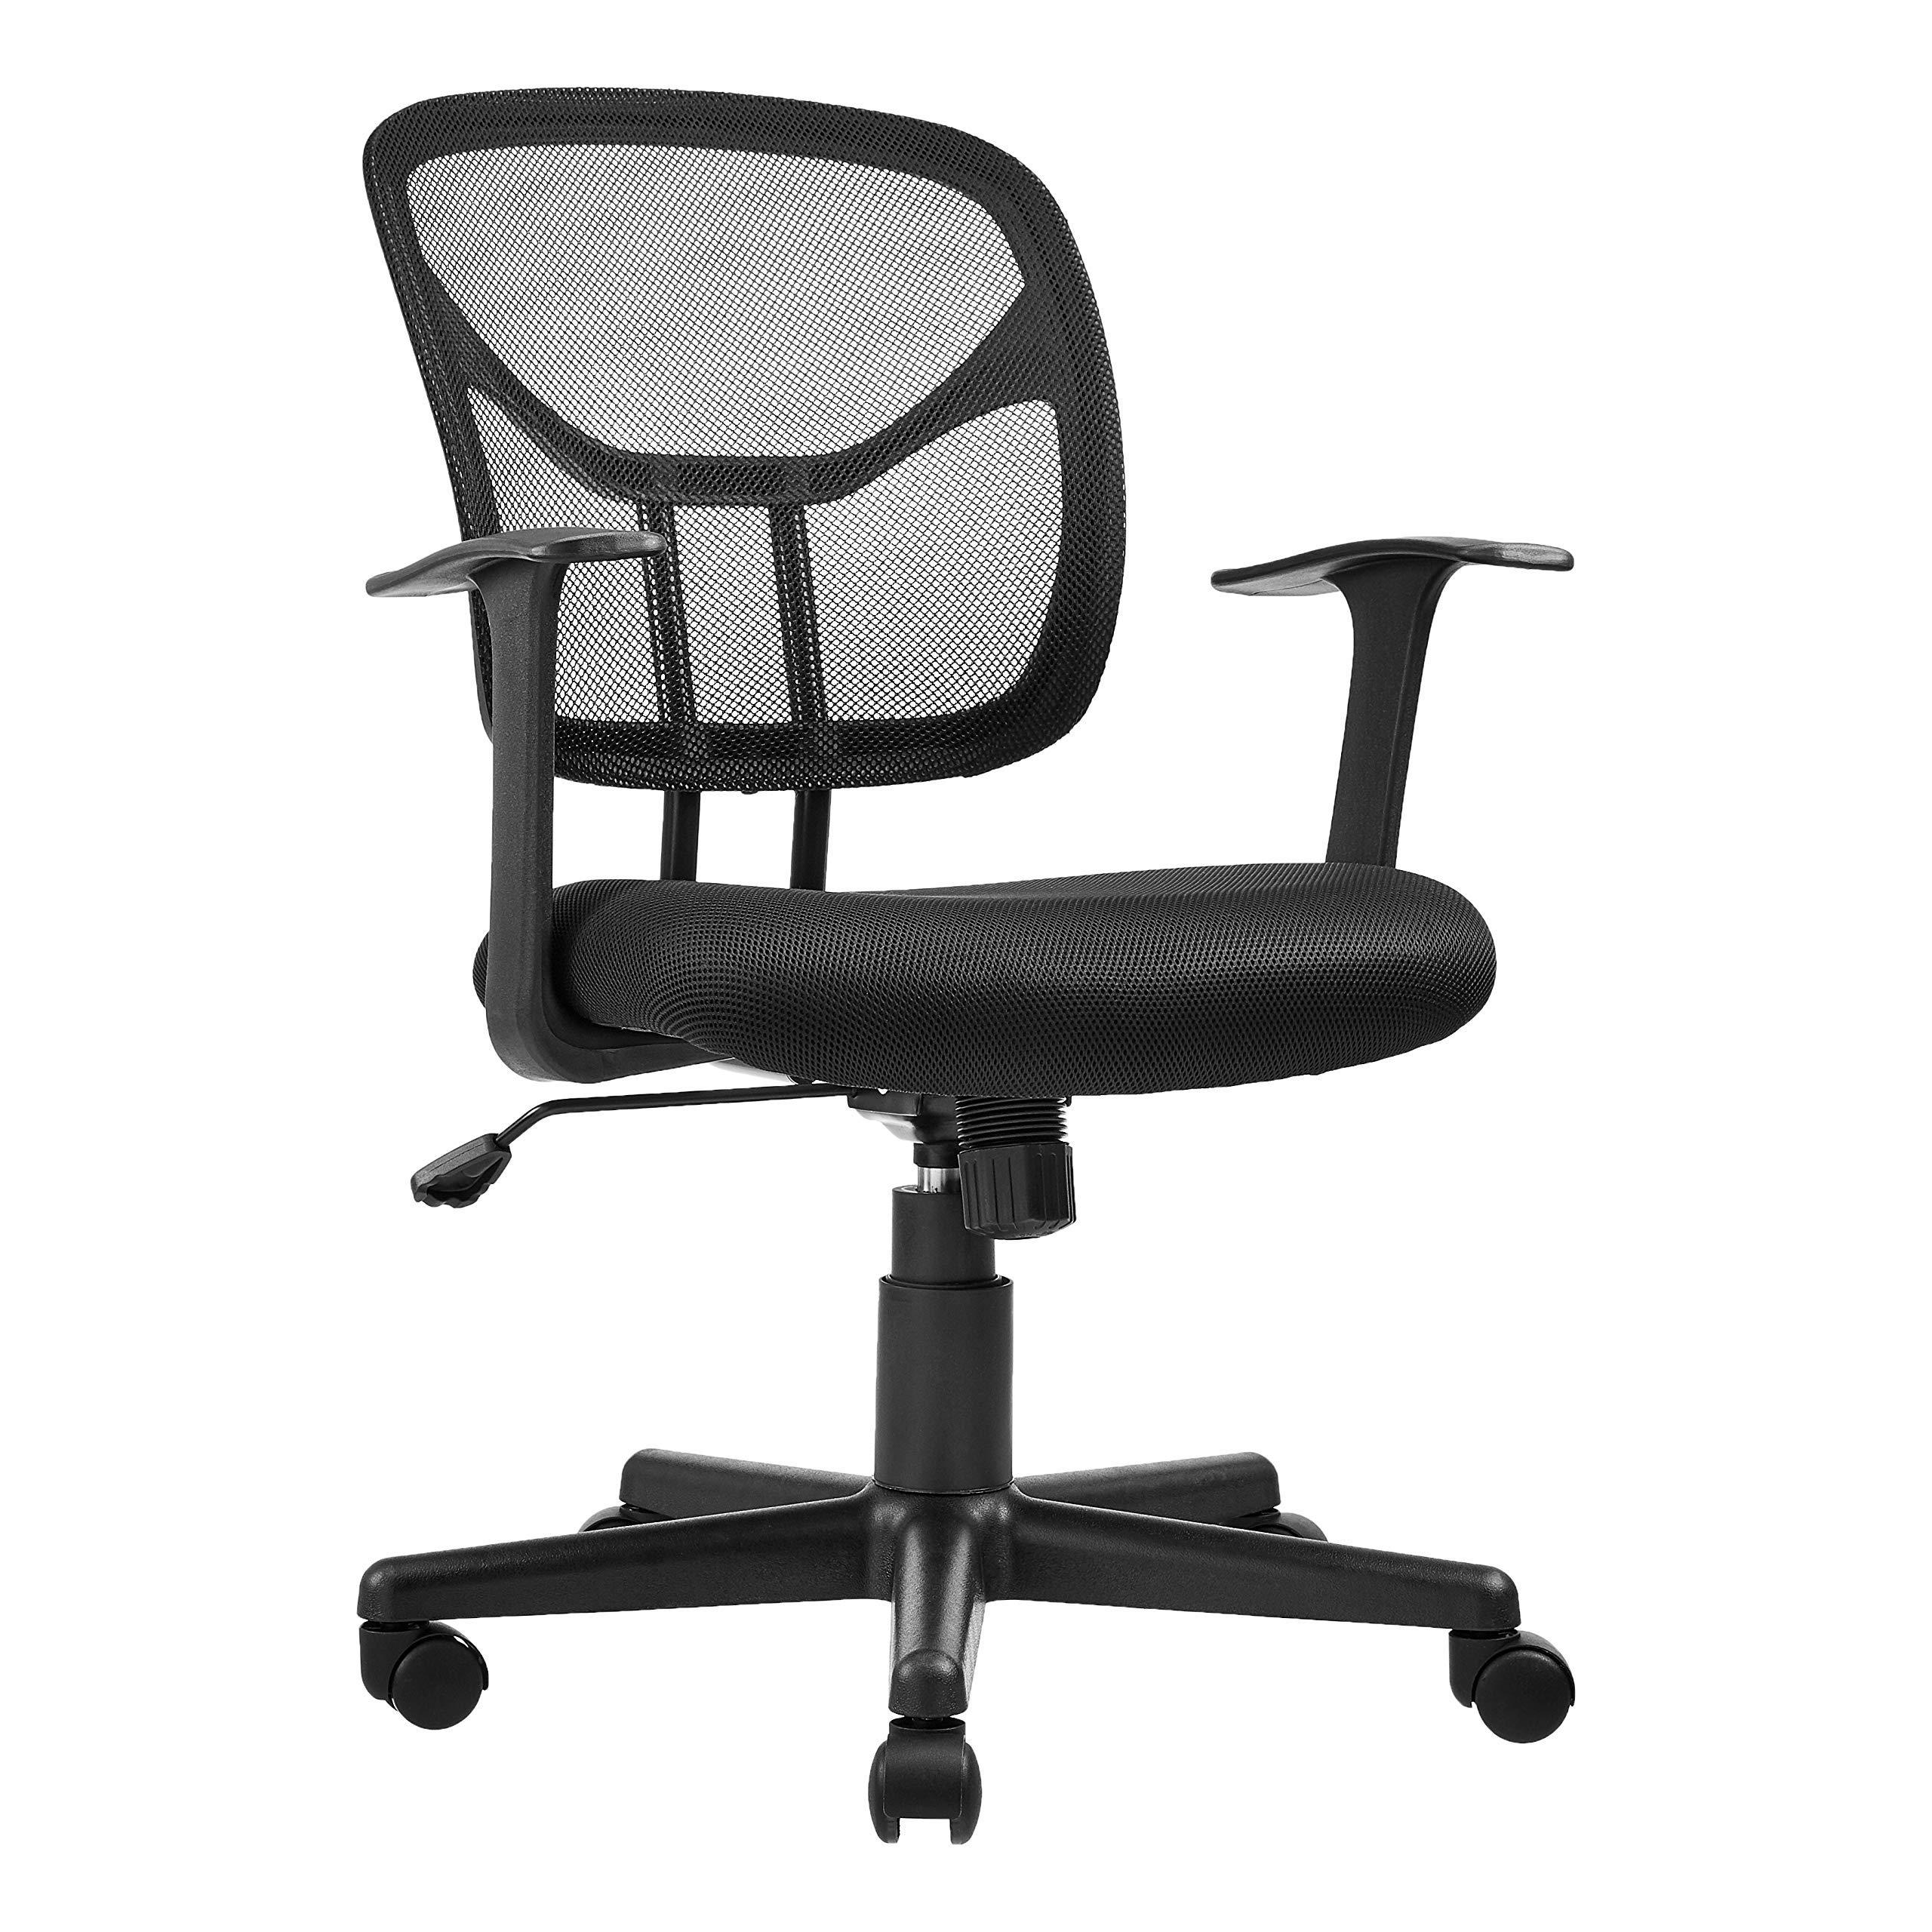 AmazonBasics Mid Back Office Chair Armrests